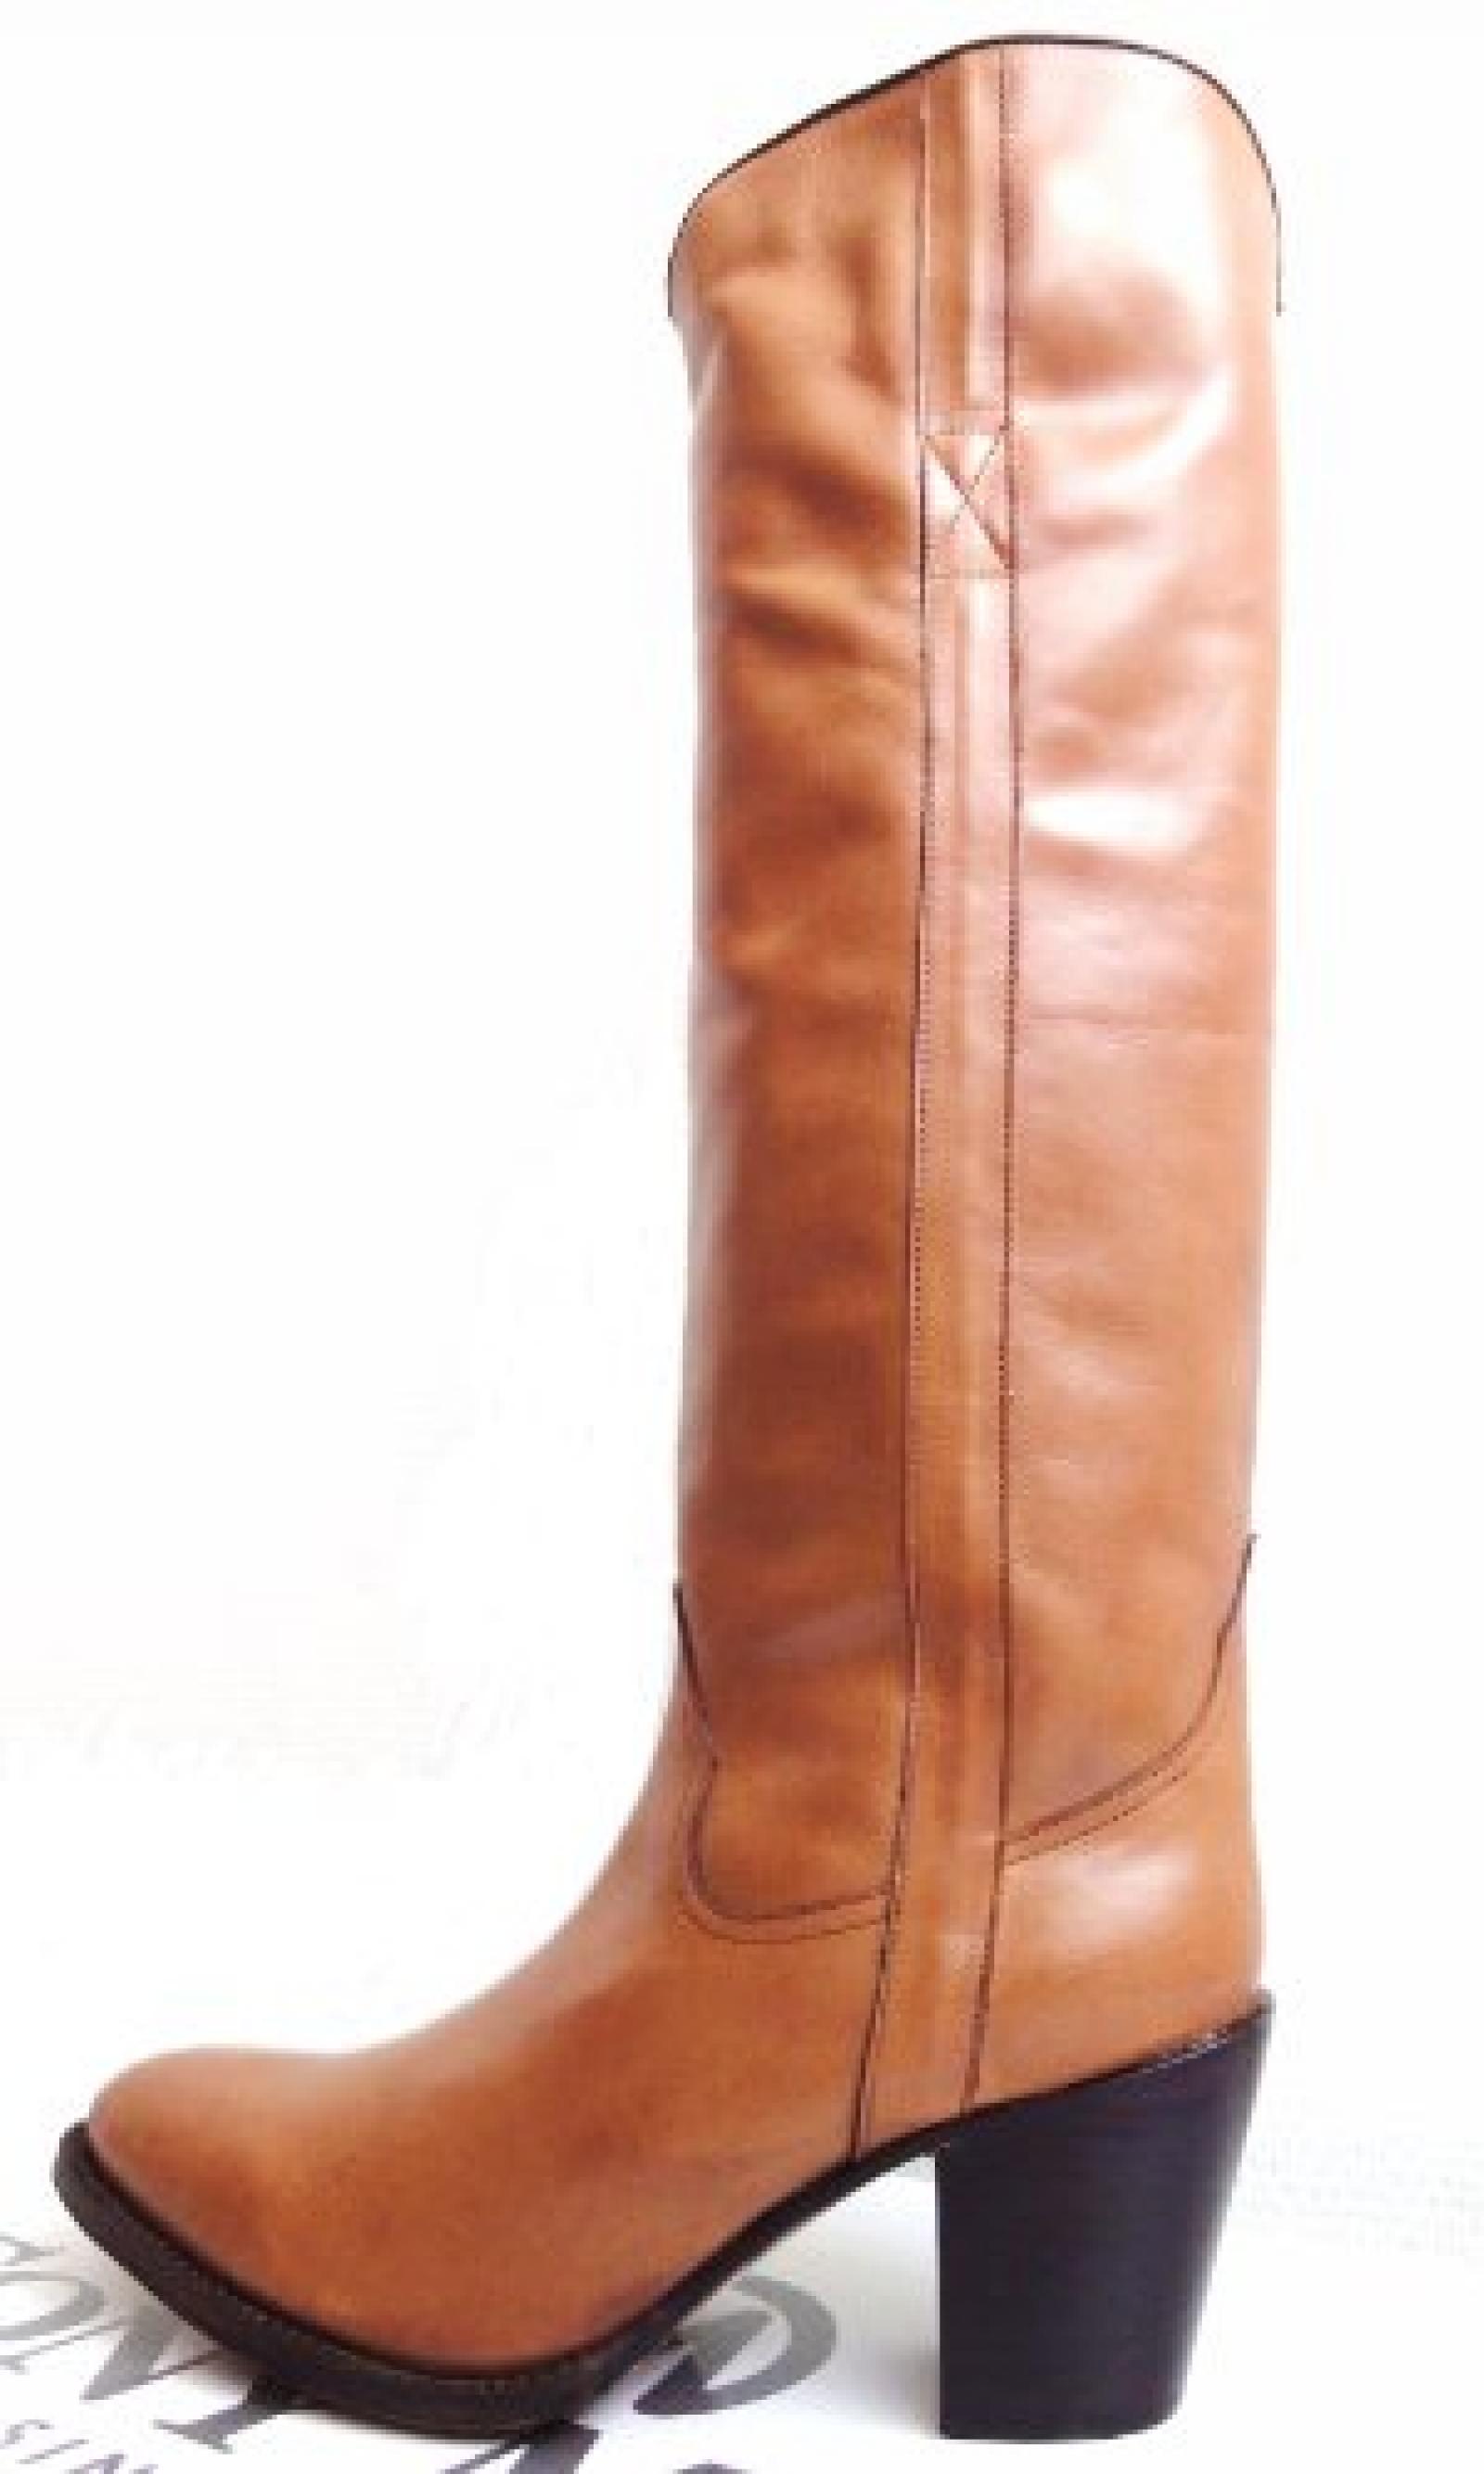 Tony Mora Fashion Stiefel Irene Ranger 447, Damen Stiefel Cognac